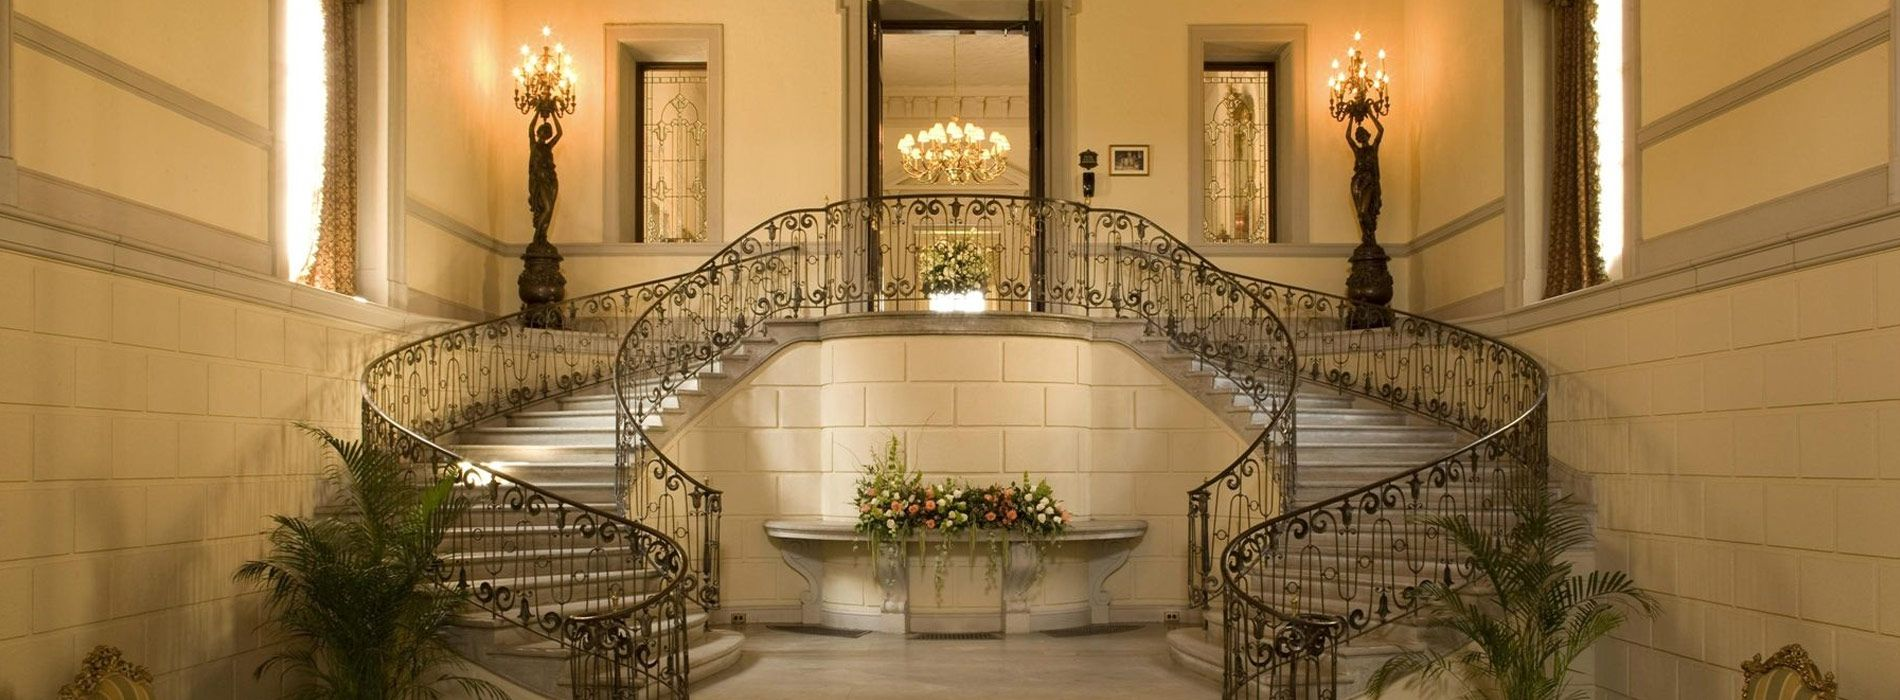 Oheka Castle S Main Entrance Grand Staircase Wedding